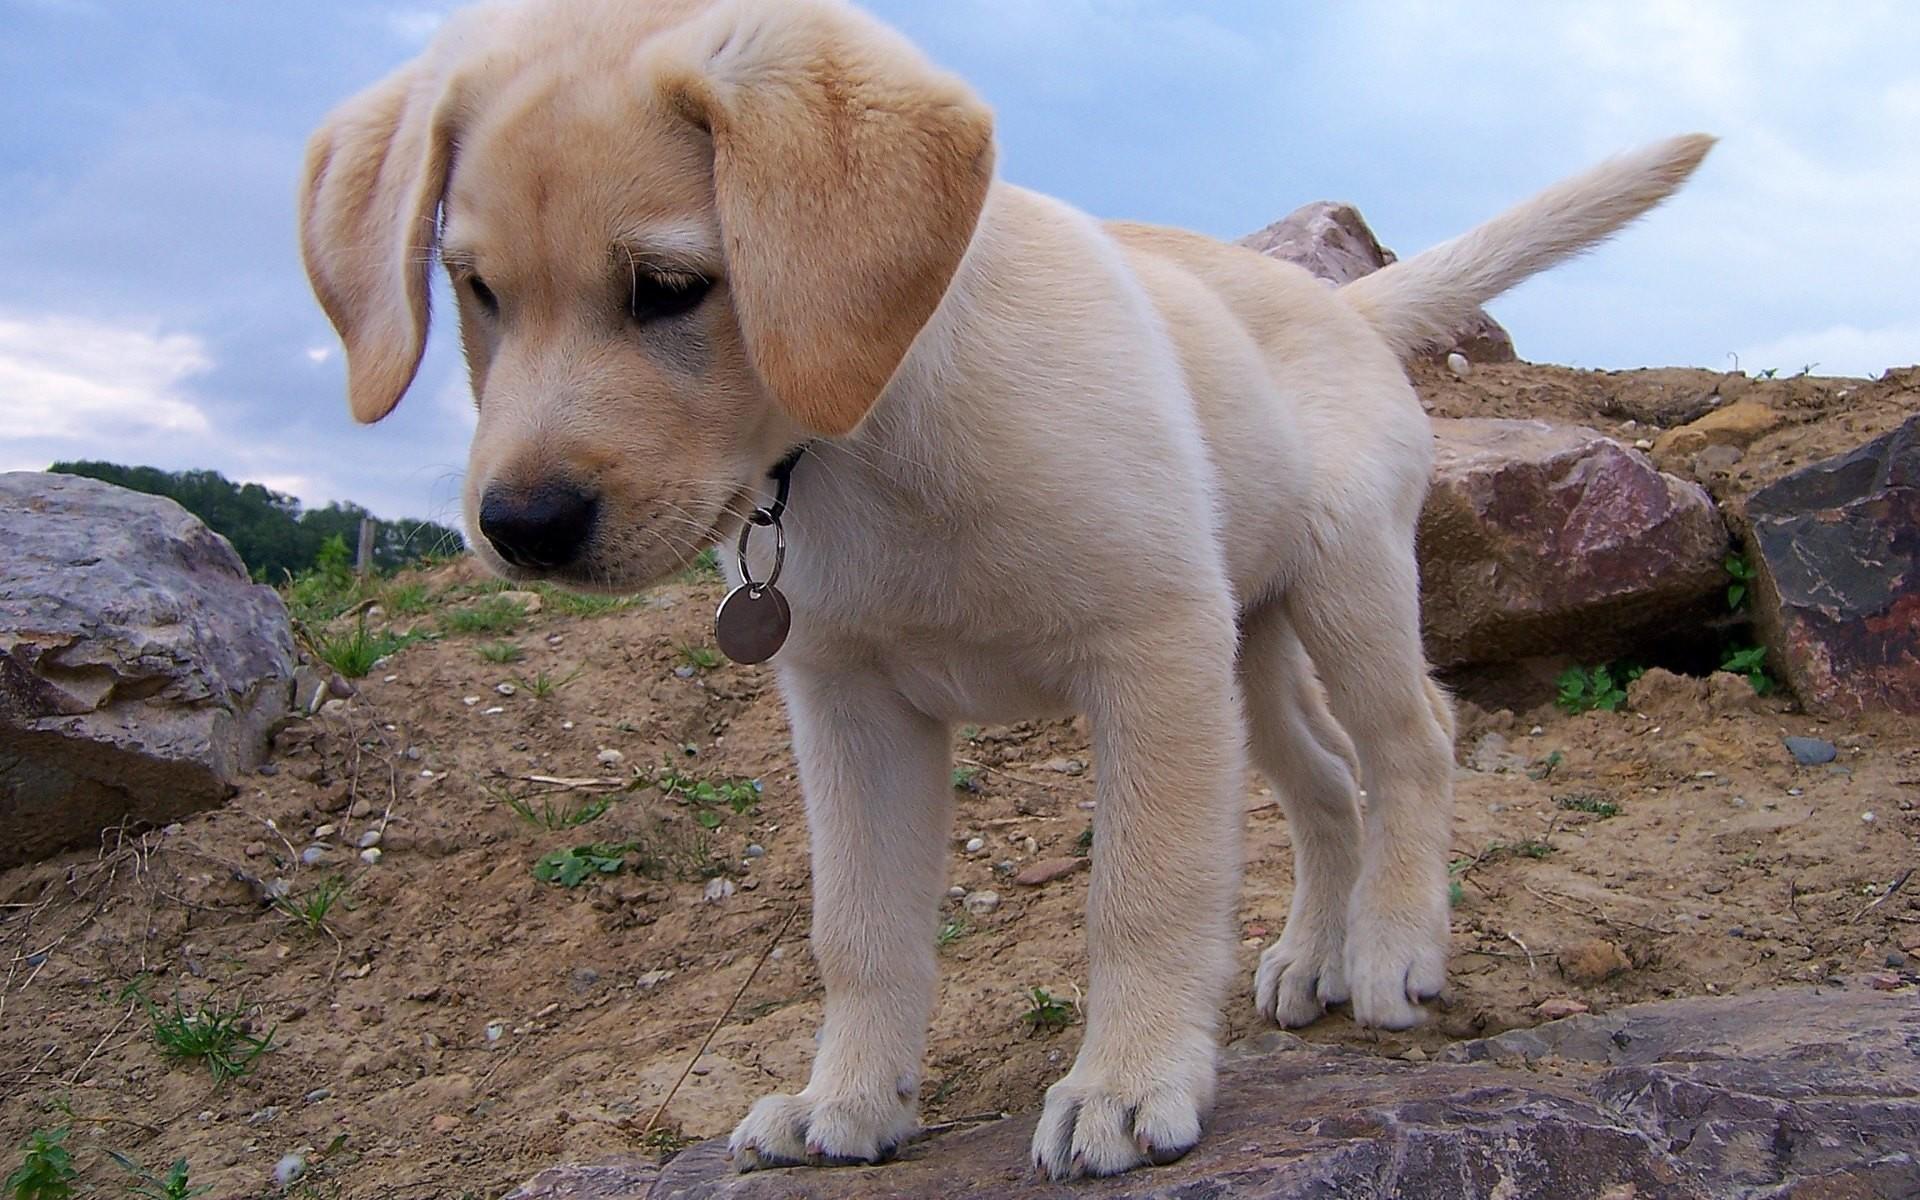 HD Wallpaper 2: Labrador Puppy